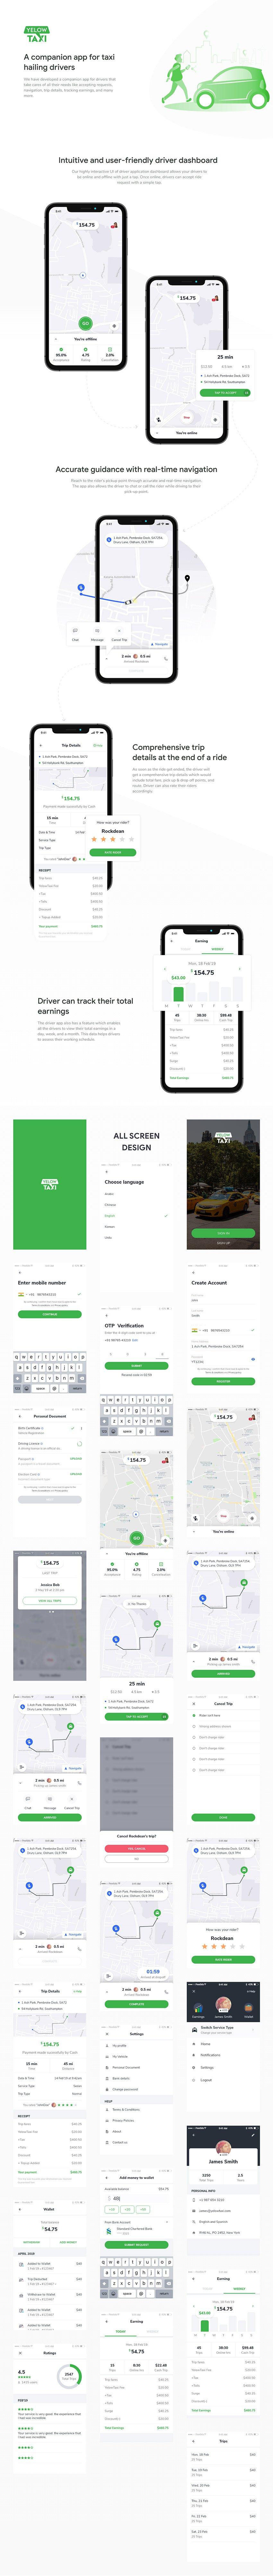 Uber Taxi App Design for Xd